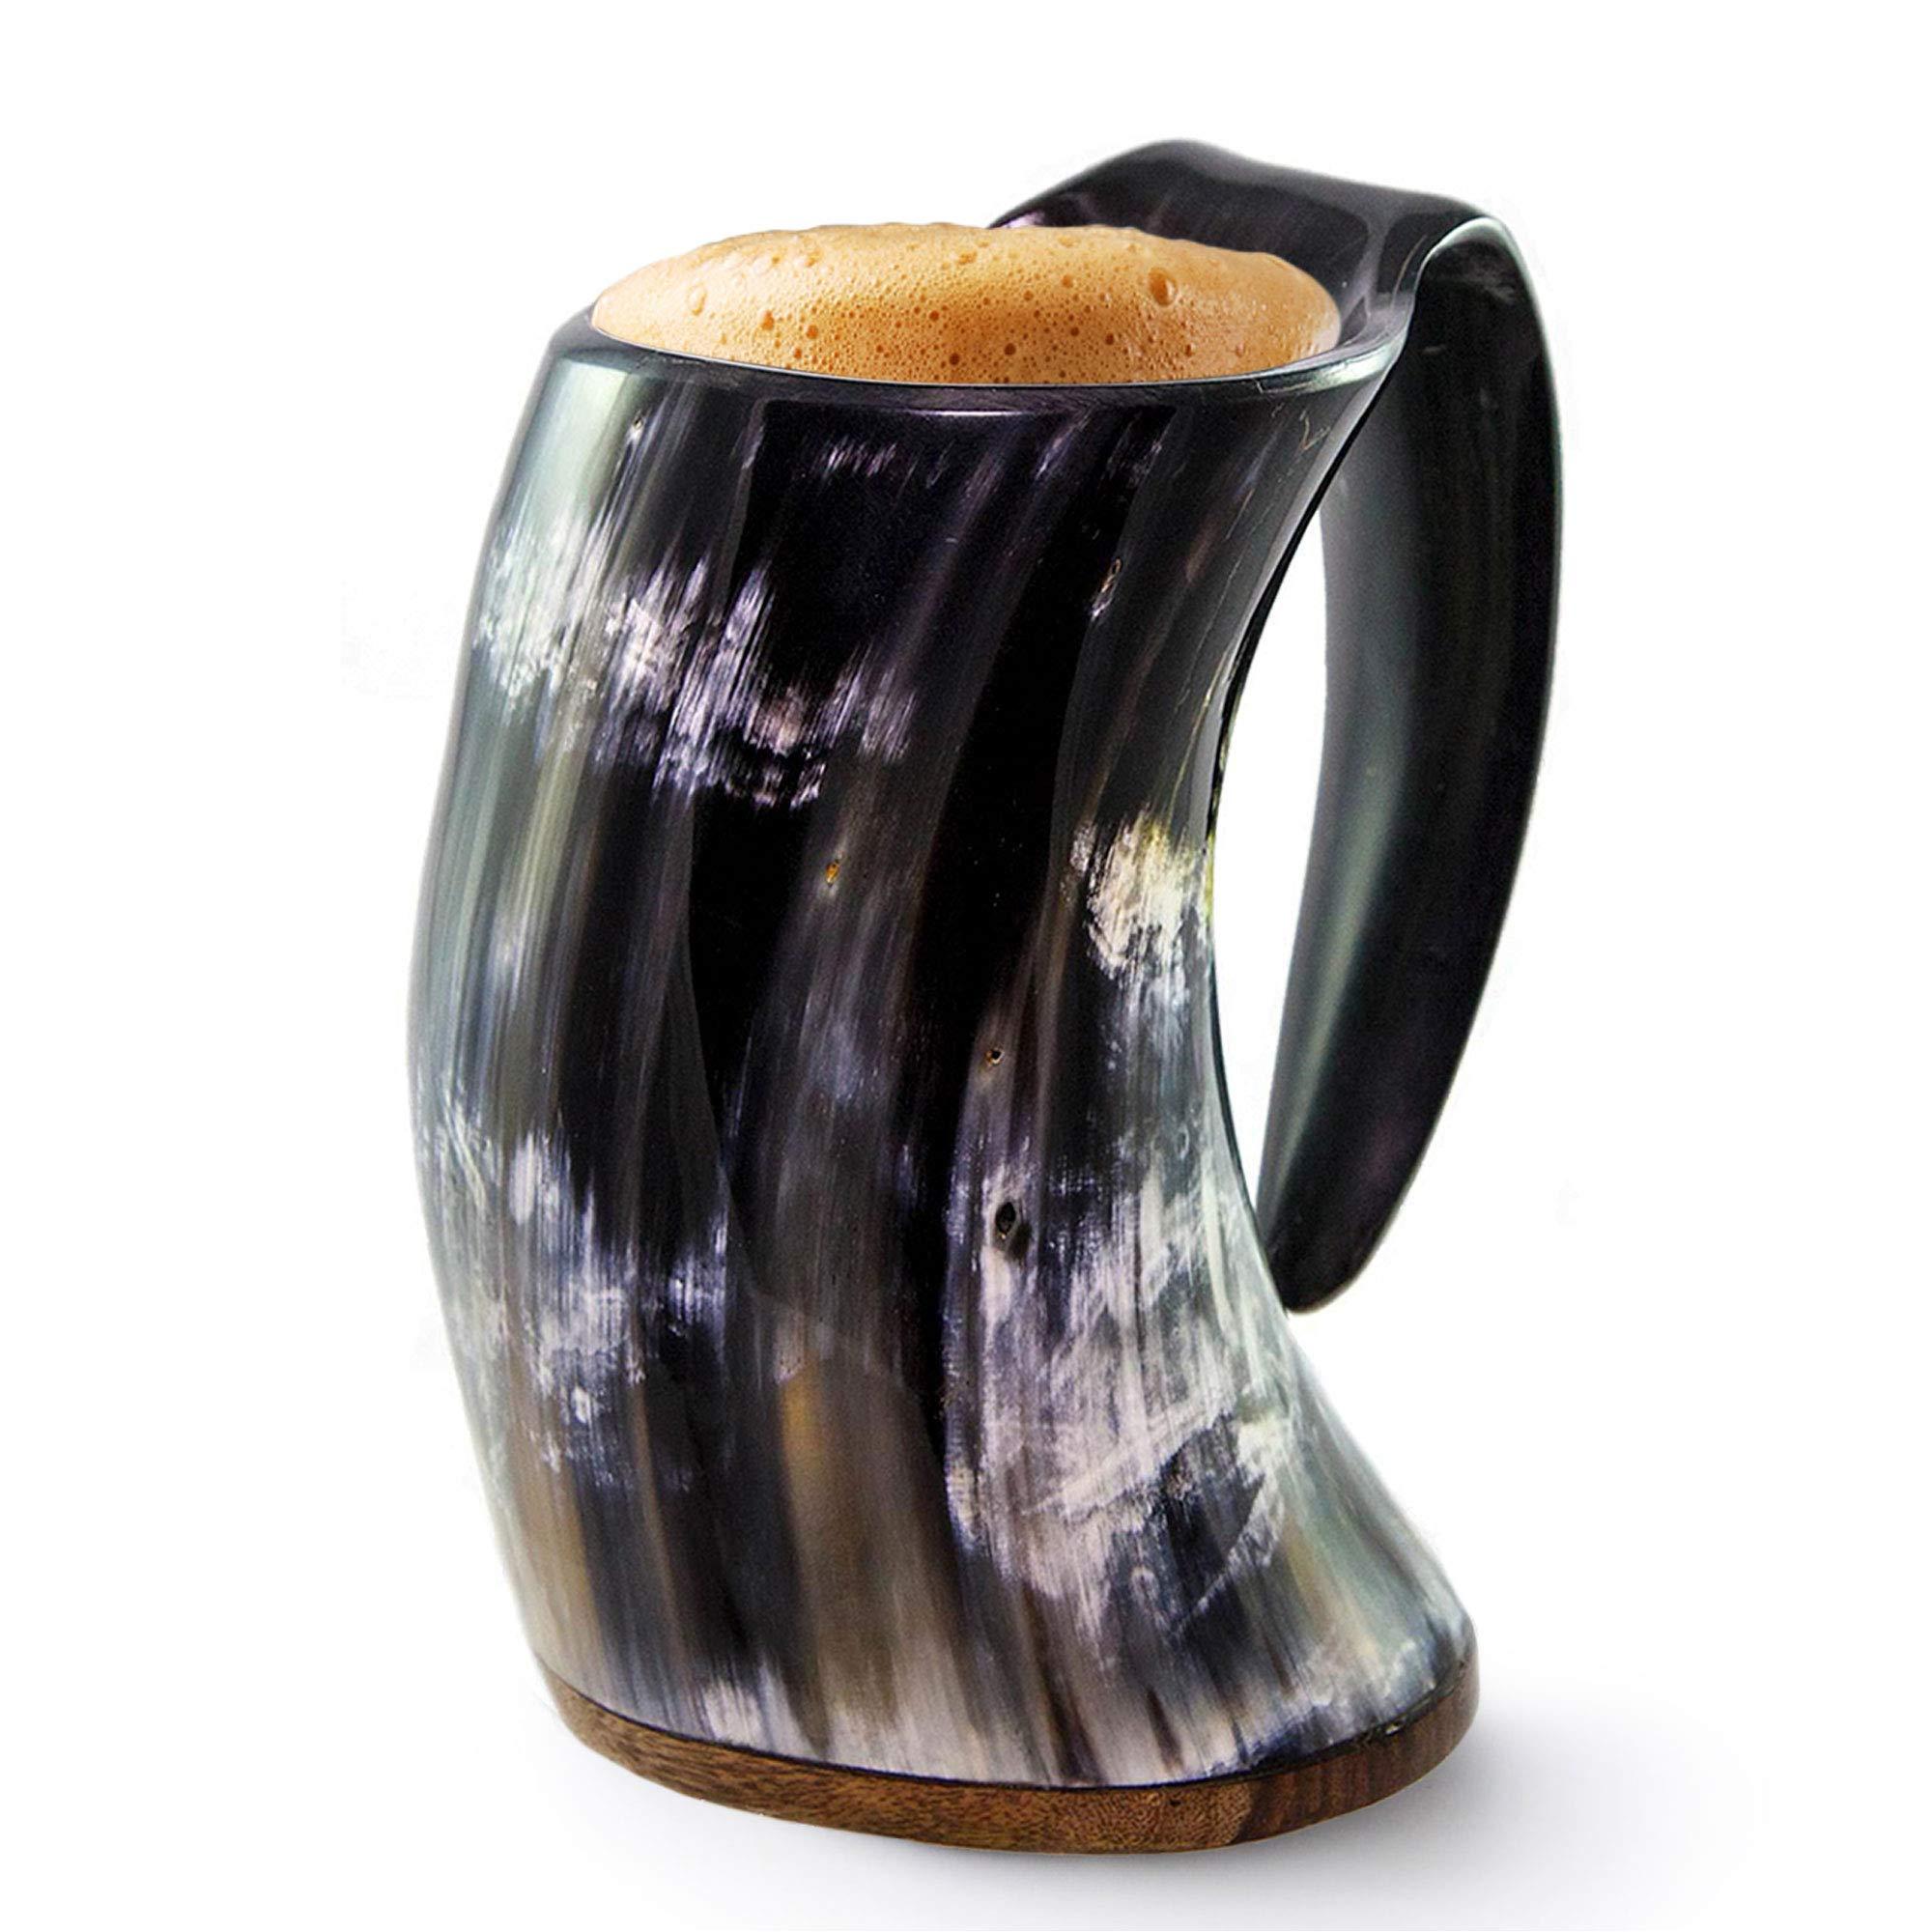 Norse Tradesman Original Viking Drinking Horn Mug - 100% Authentic Beer Horn Tankard w/Rosewood Base & Burlap Gift Sack |''The Original'', Polished, X-Large